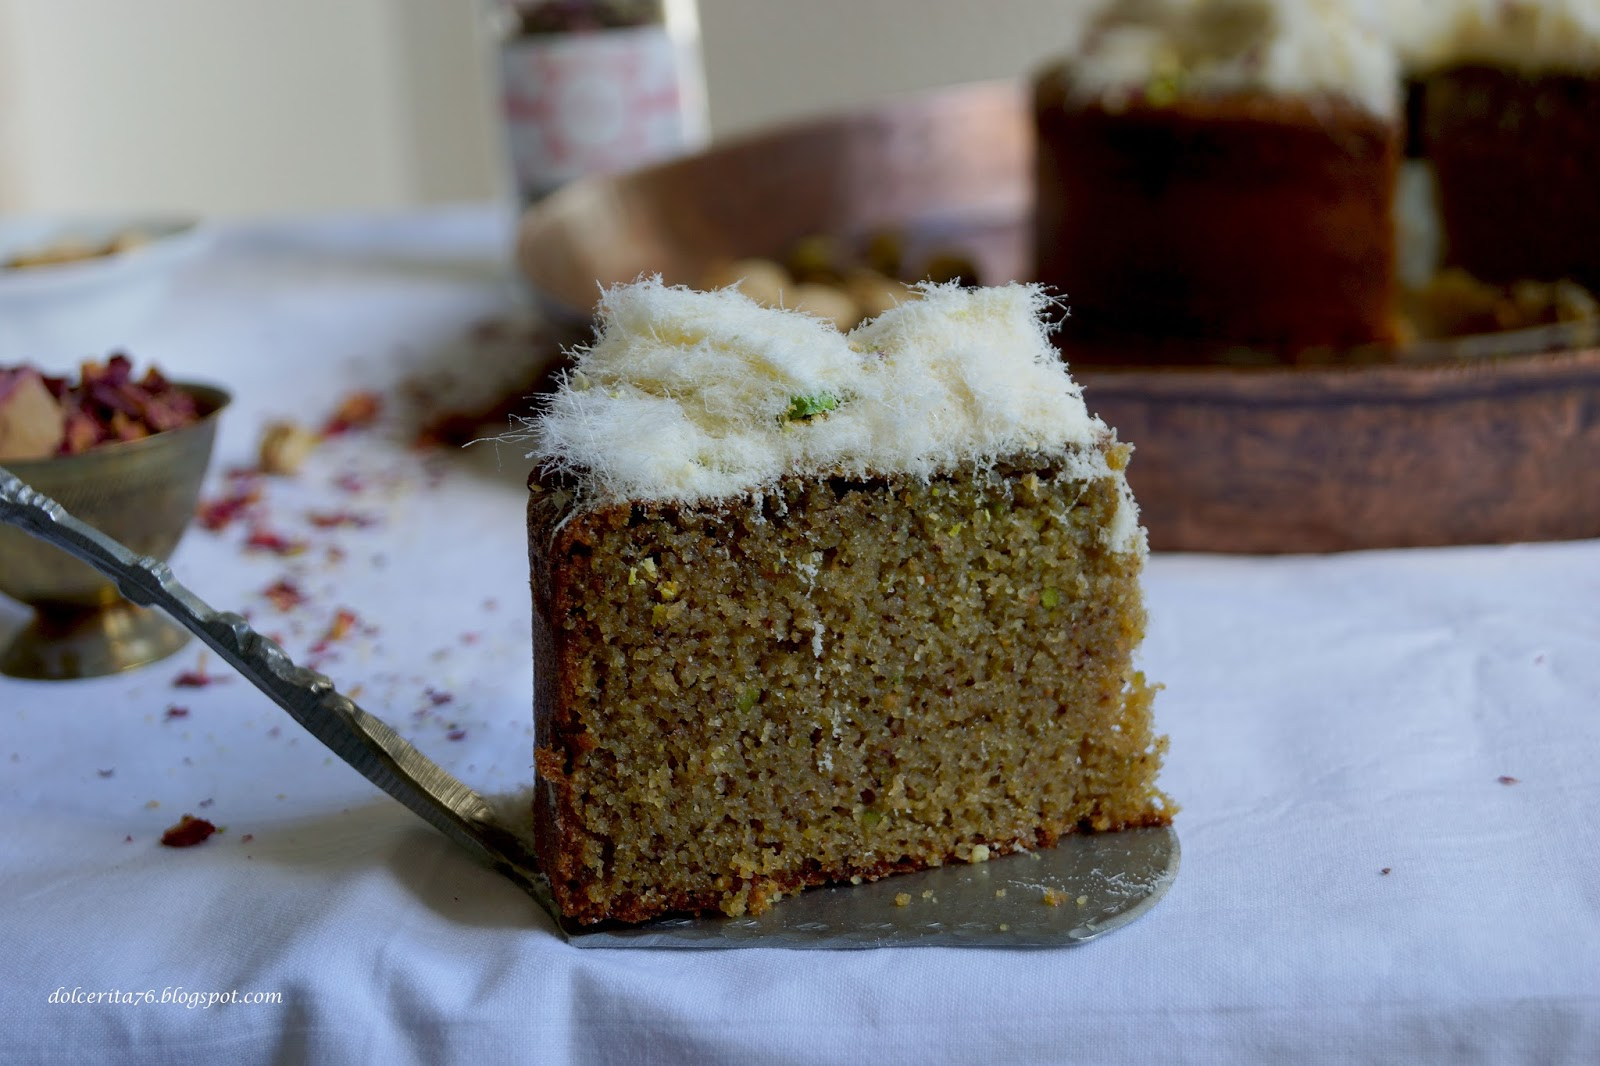 Dolce Rita: Semolina, Pistachio and Rose Water Cake